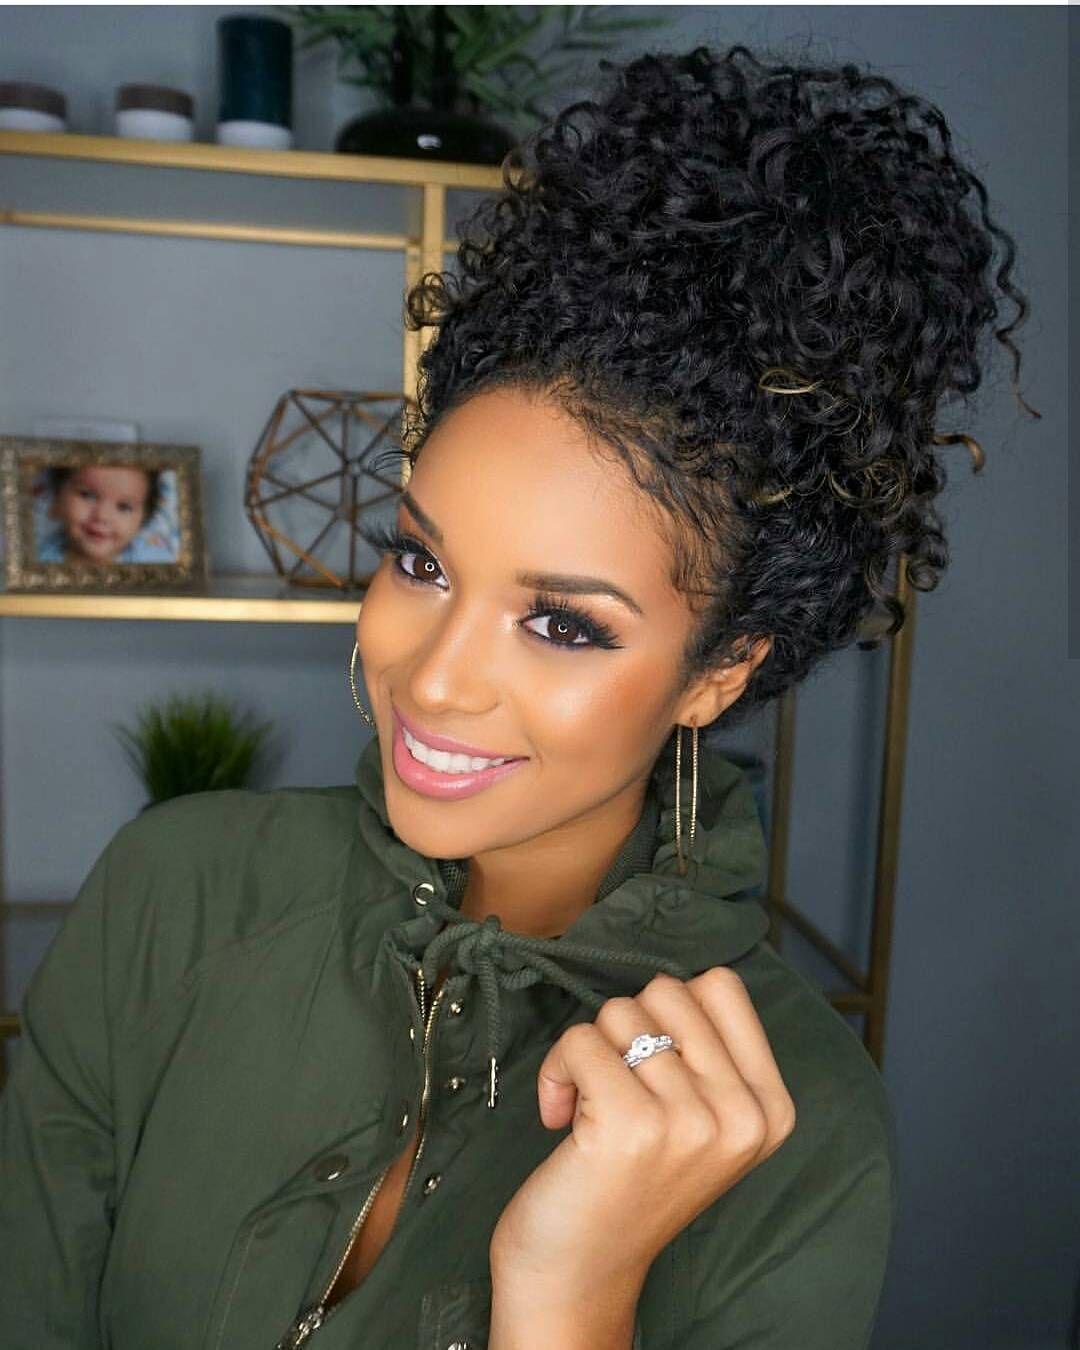 Regardez cette photo instagram de blackbeautifulclassy u j